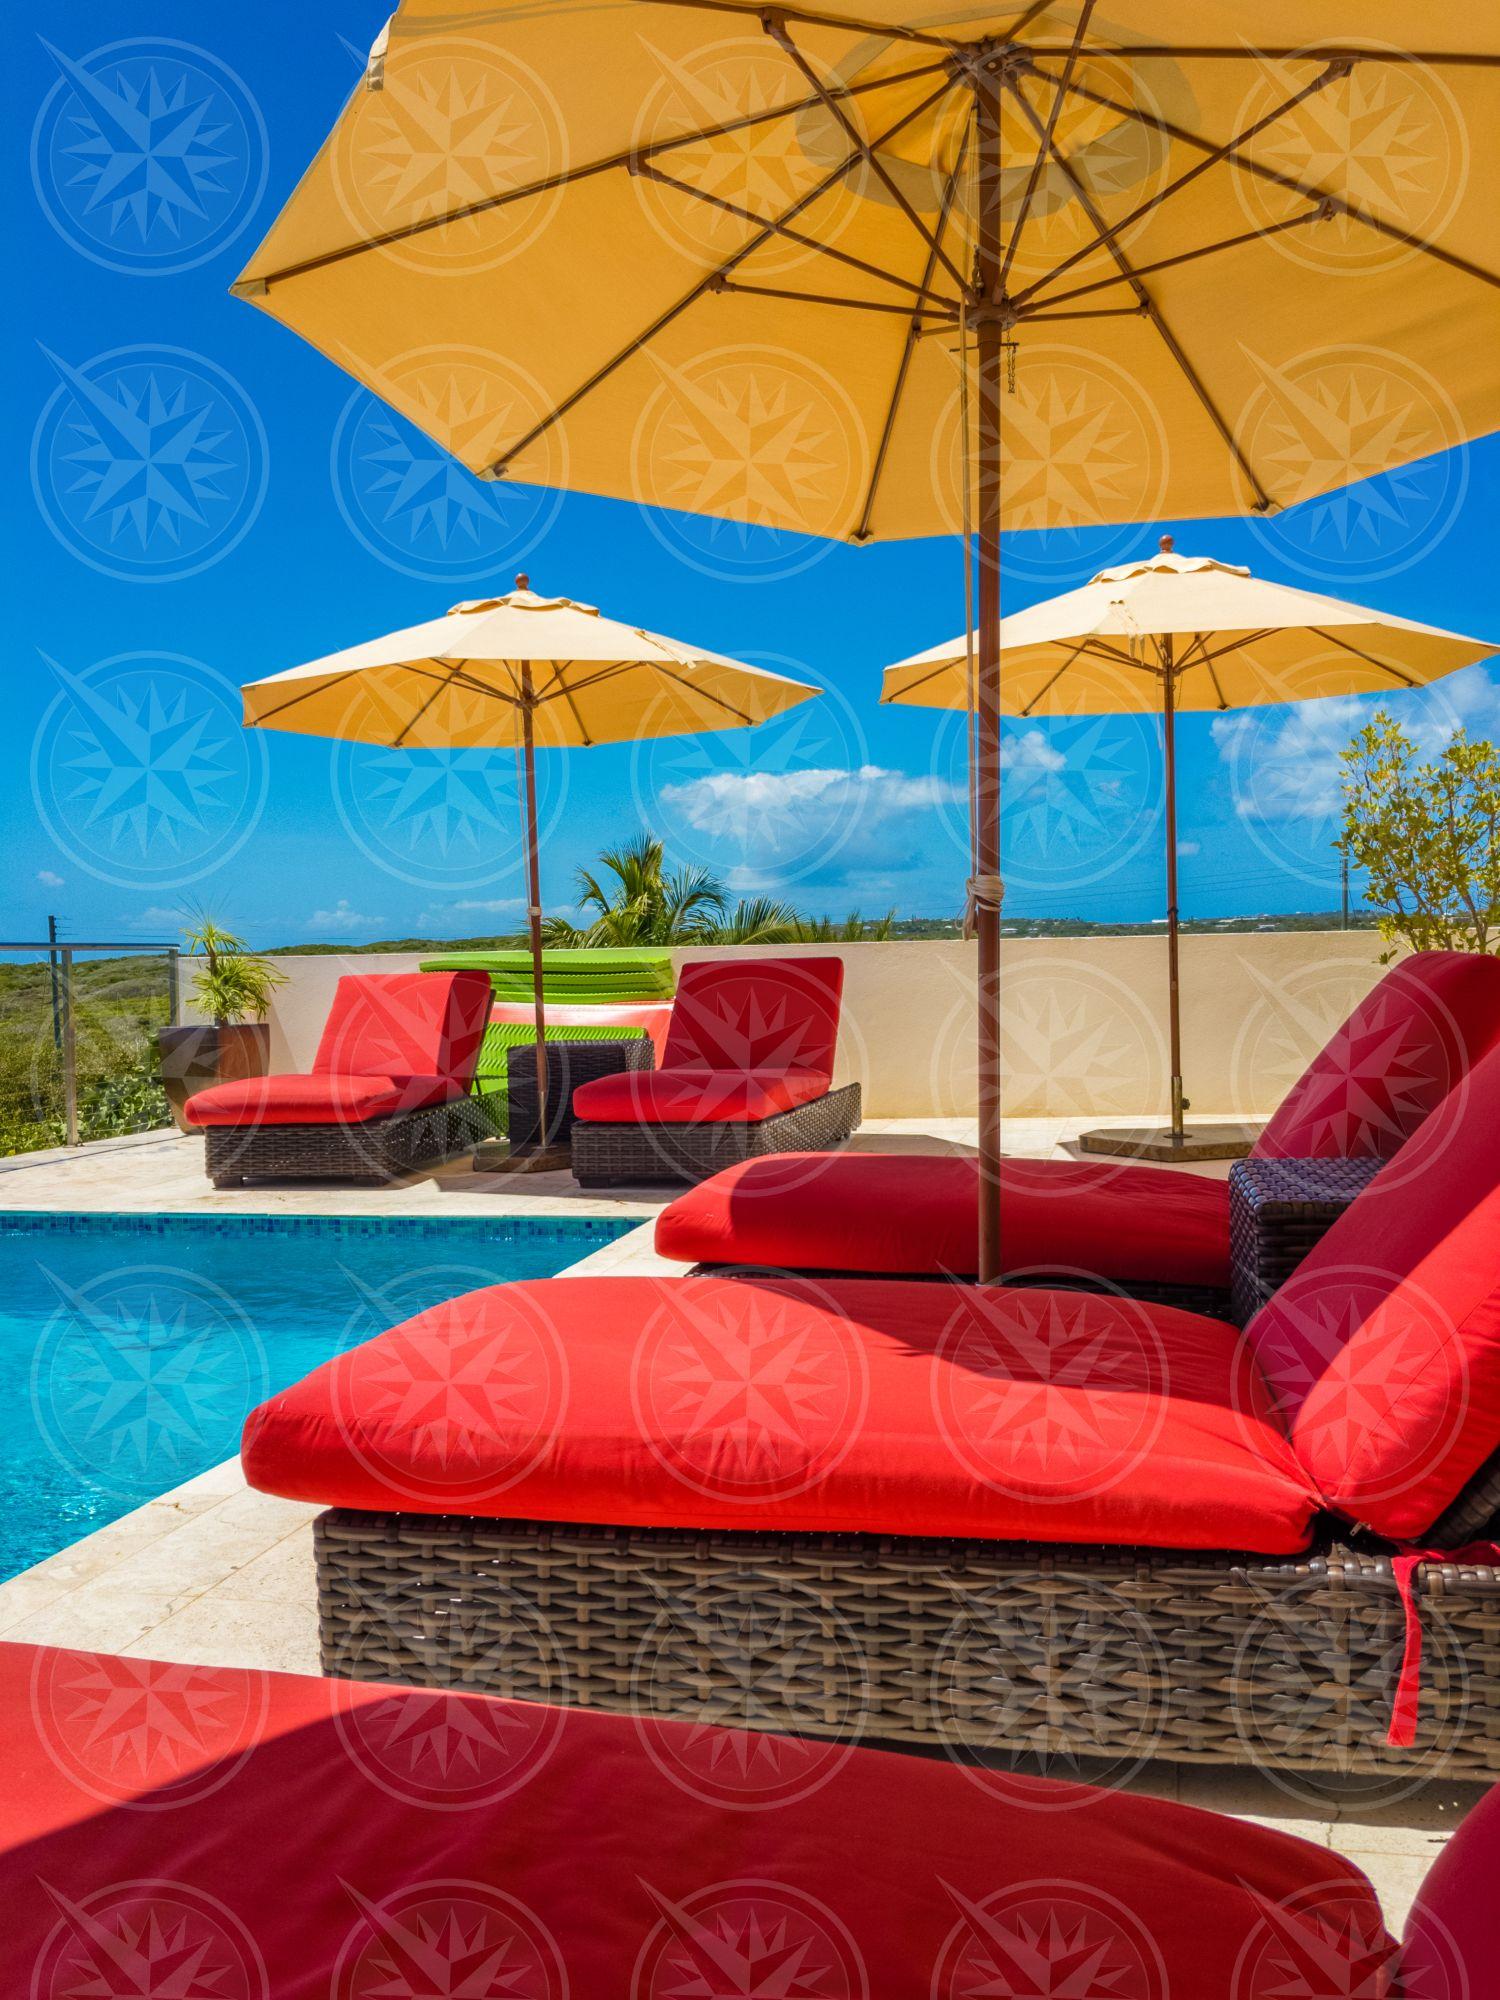 Lounge chairs around pool